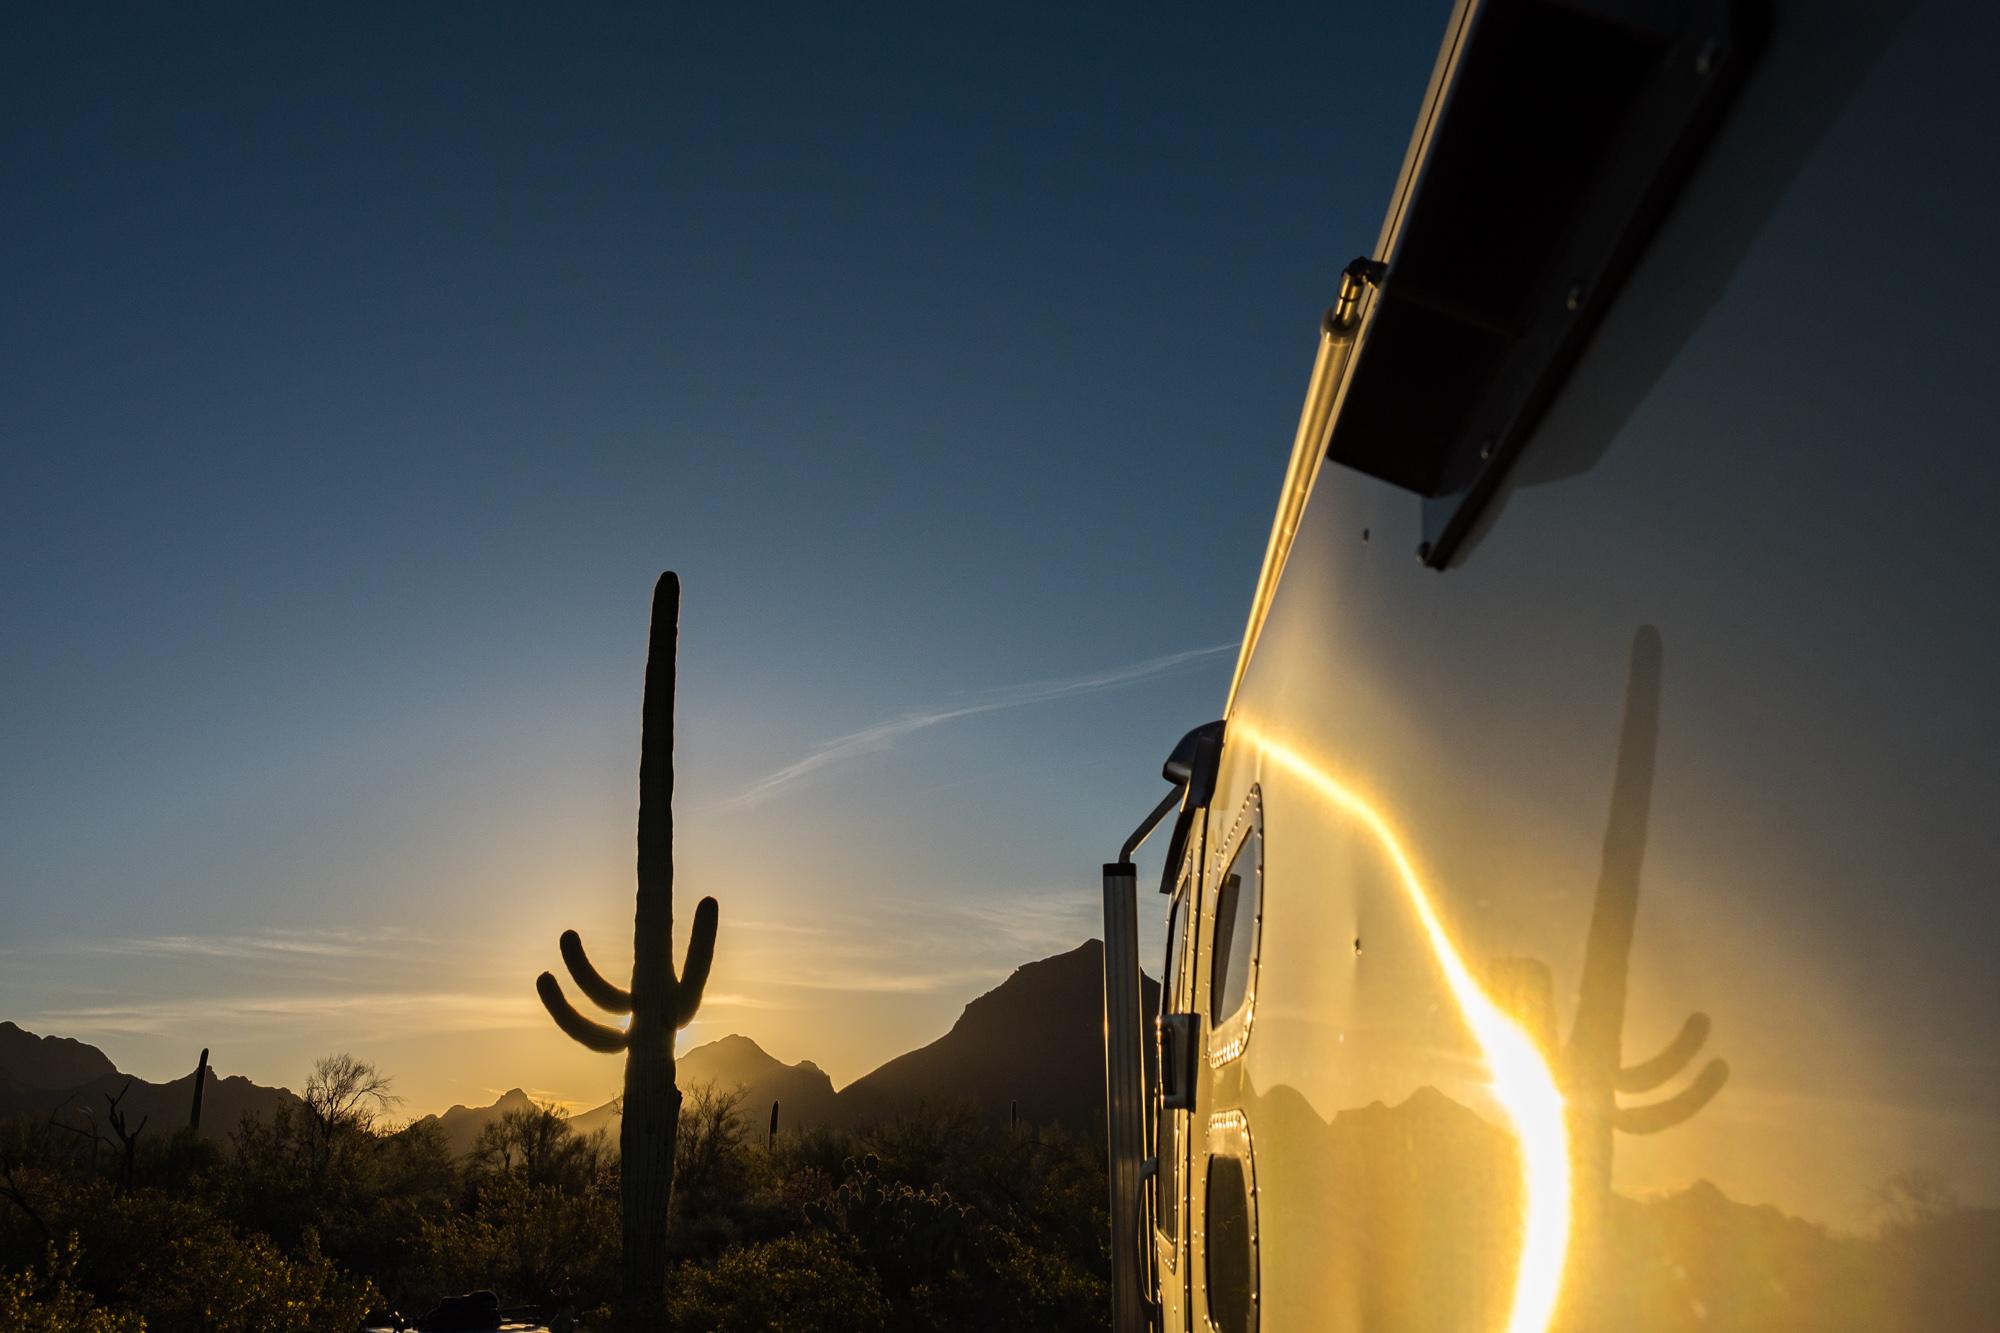 Saguaro cactus silhouettes at sunset in Saguaro National Park in Arizona.